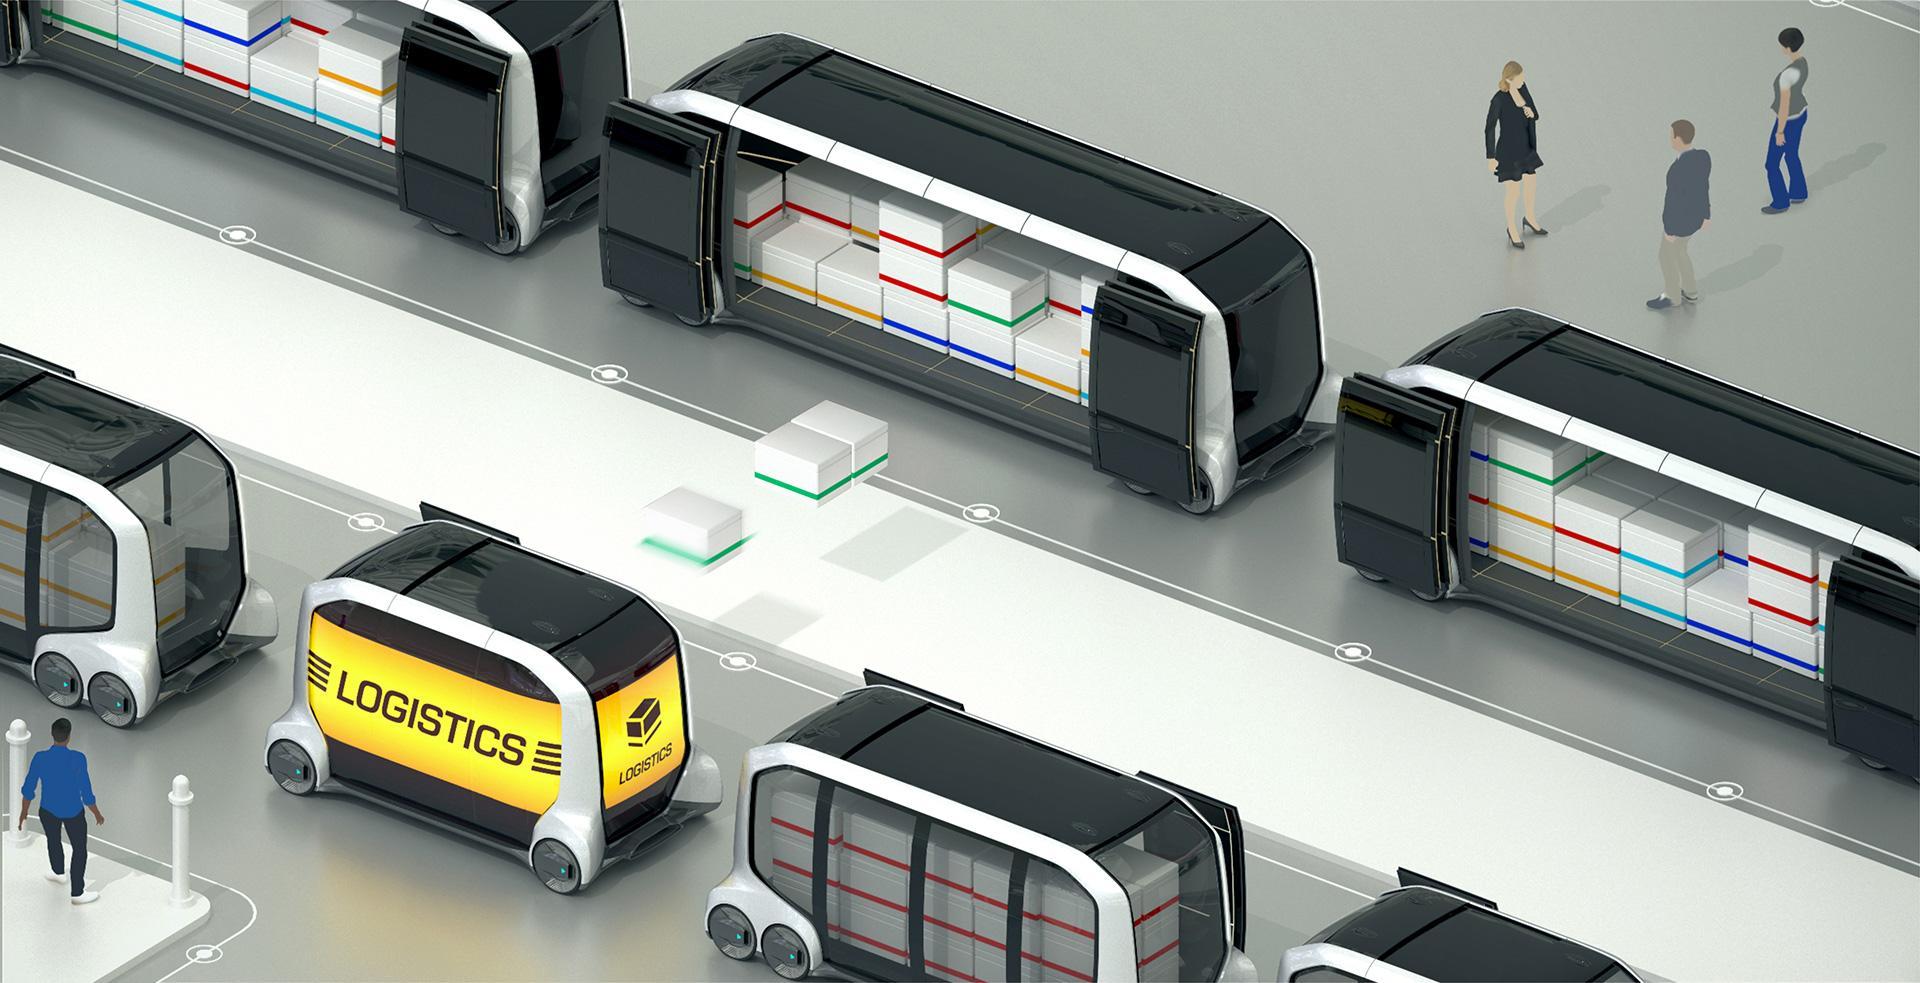 Toyota e-Palette logistics